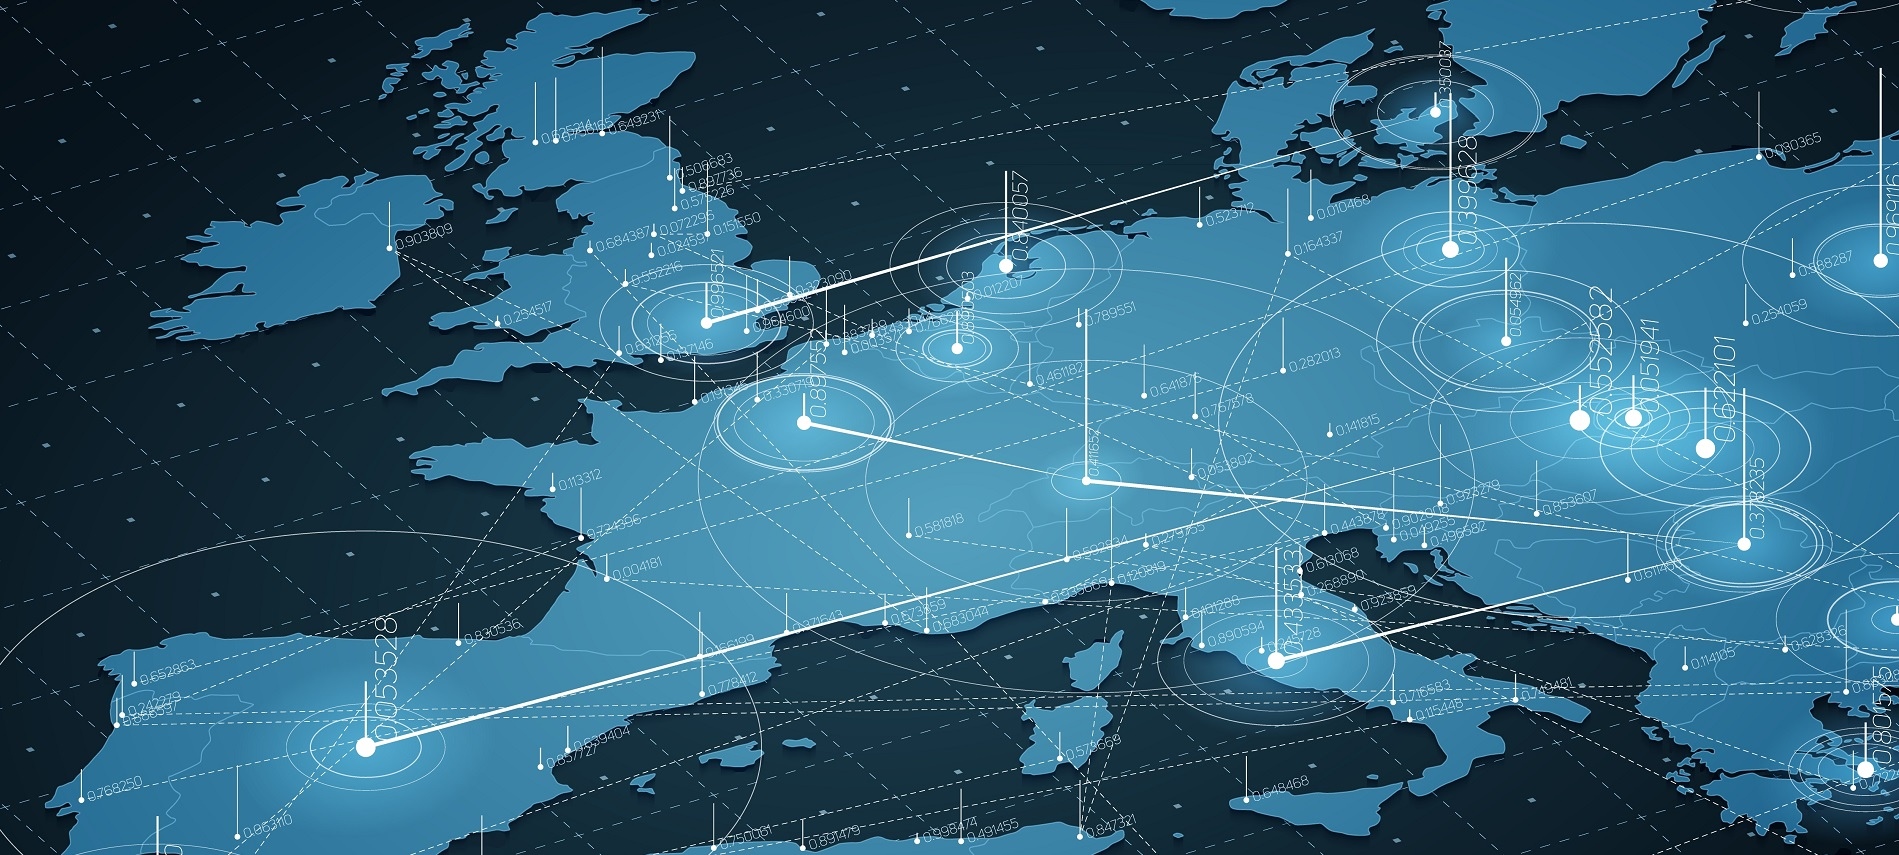 European Public Sphere